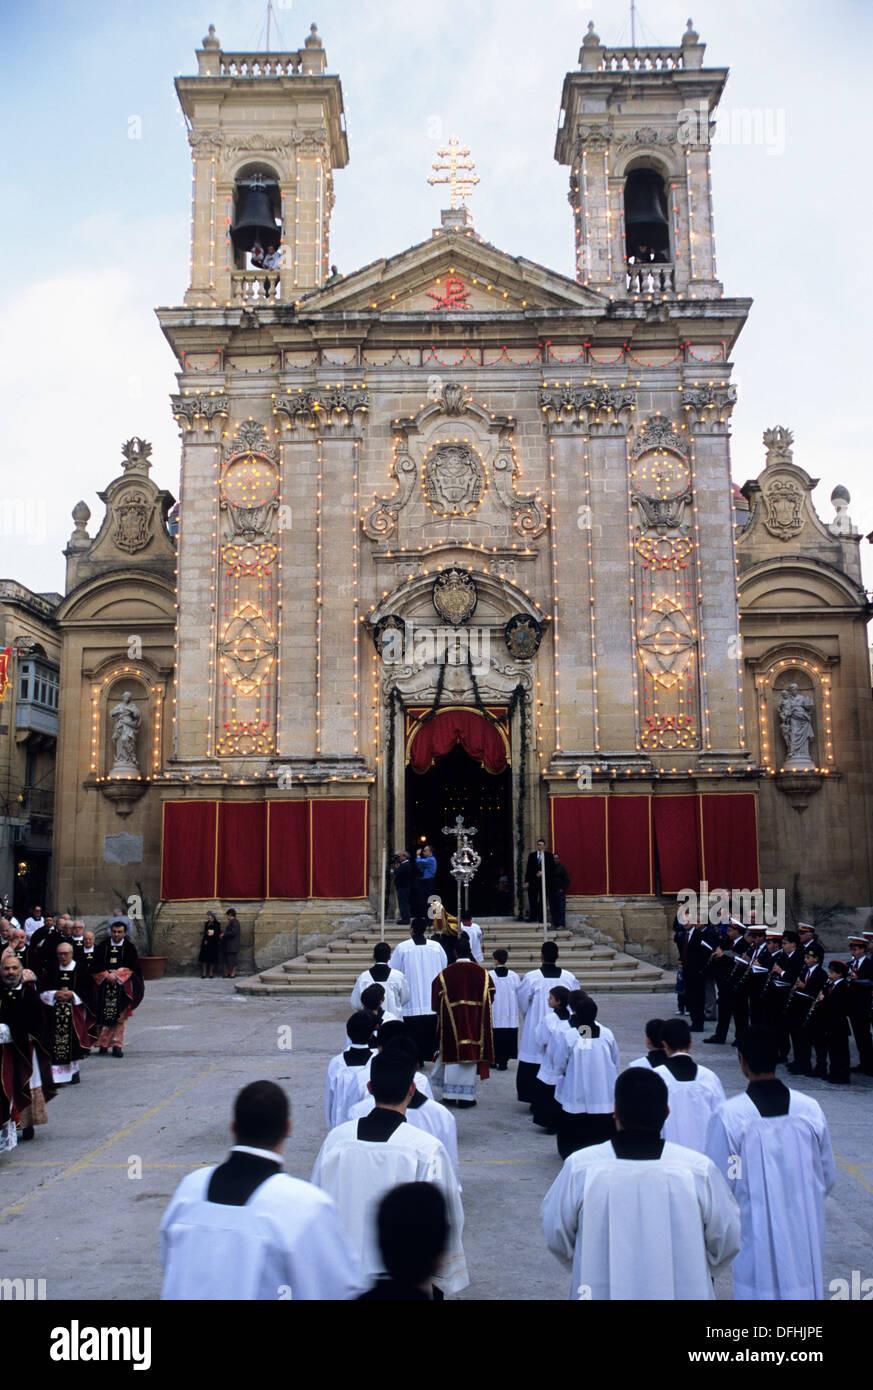 religious procession to the St George´s Basilica, Victoria, Gozo, Malta, Mediterranean Sea, Europe - Stock Image